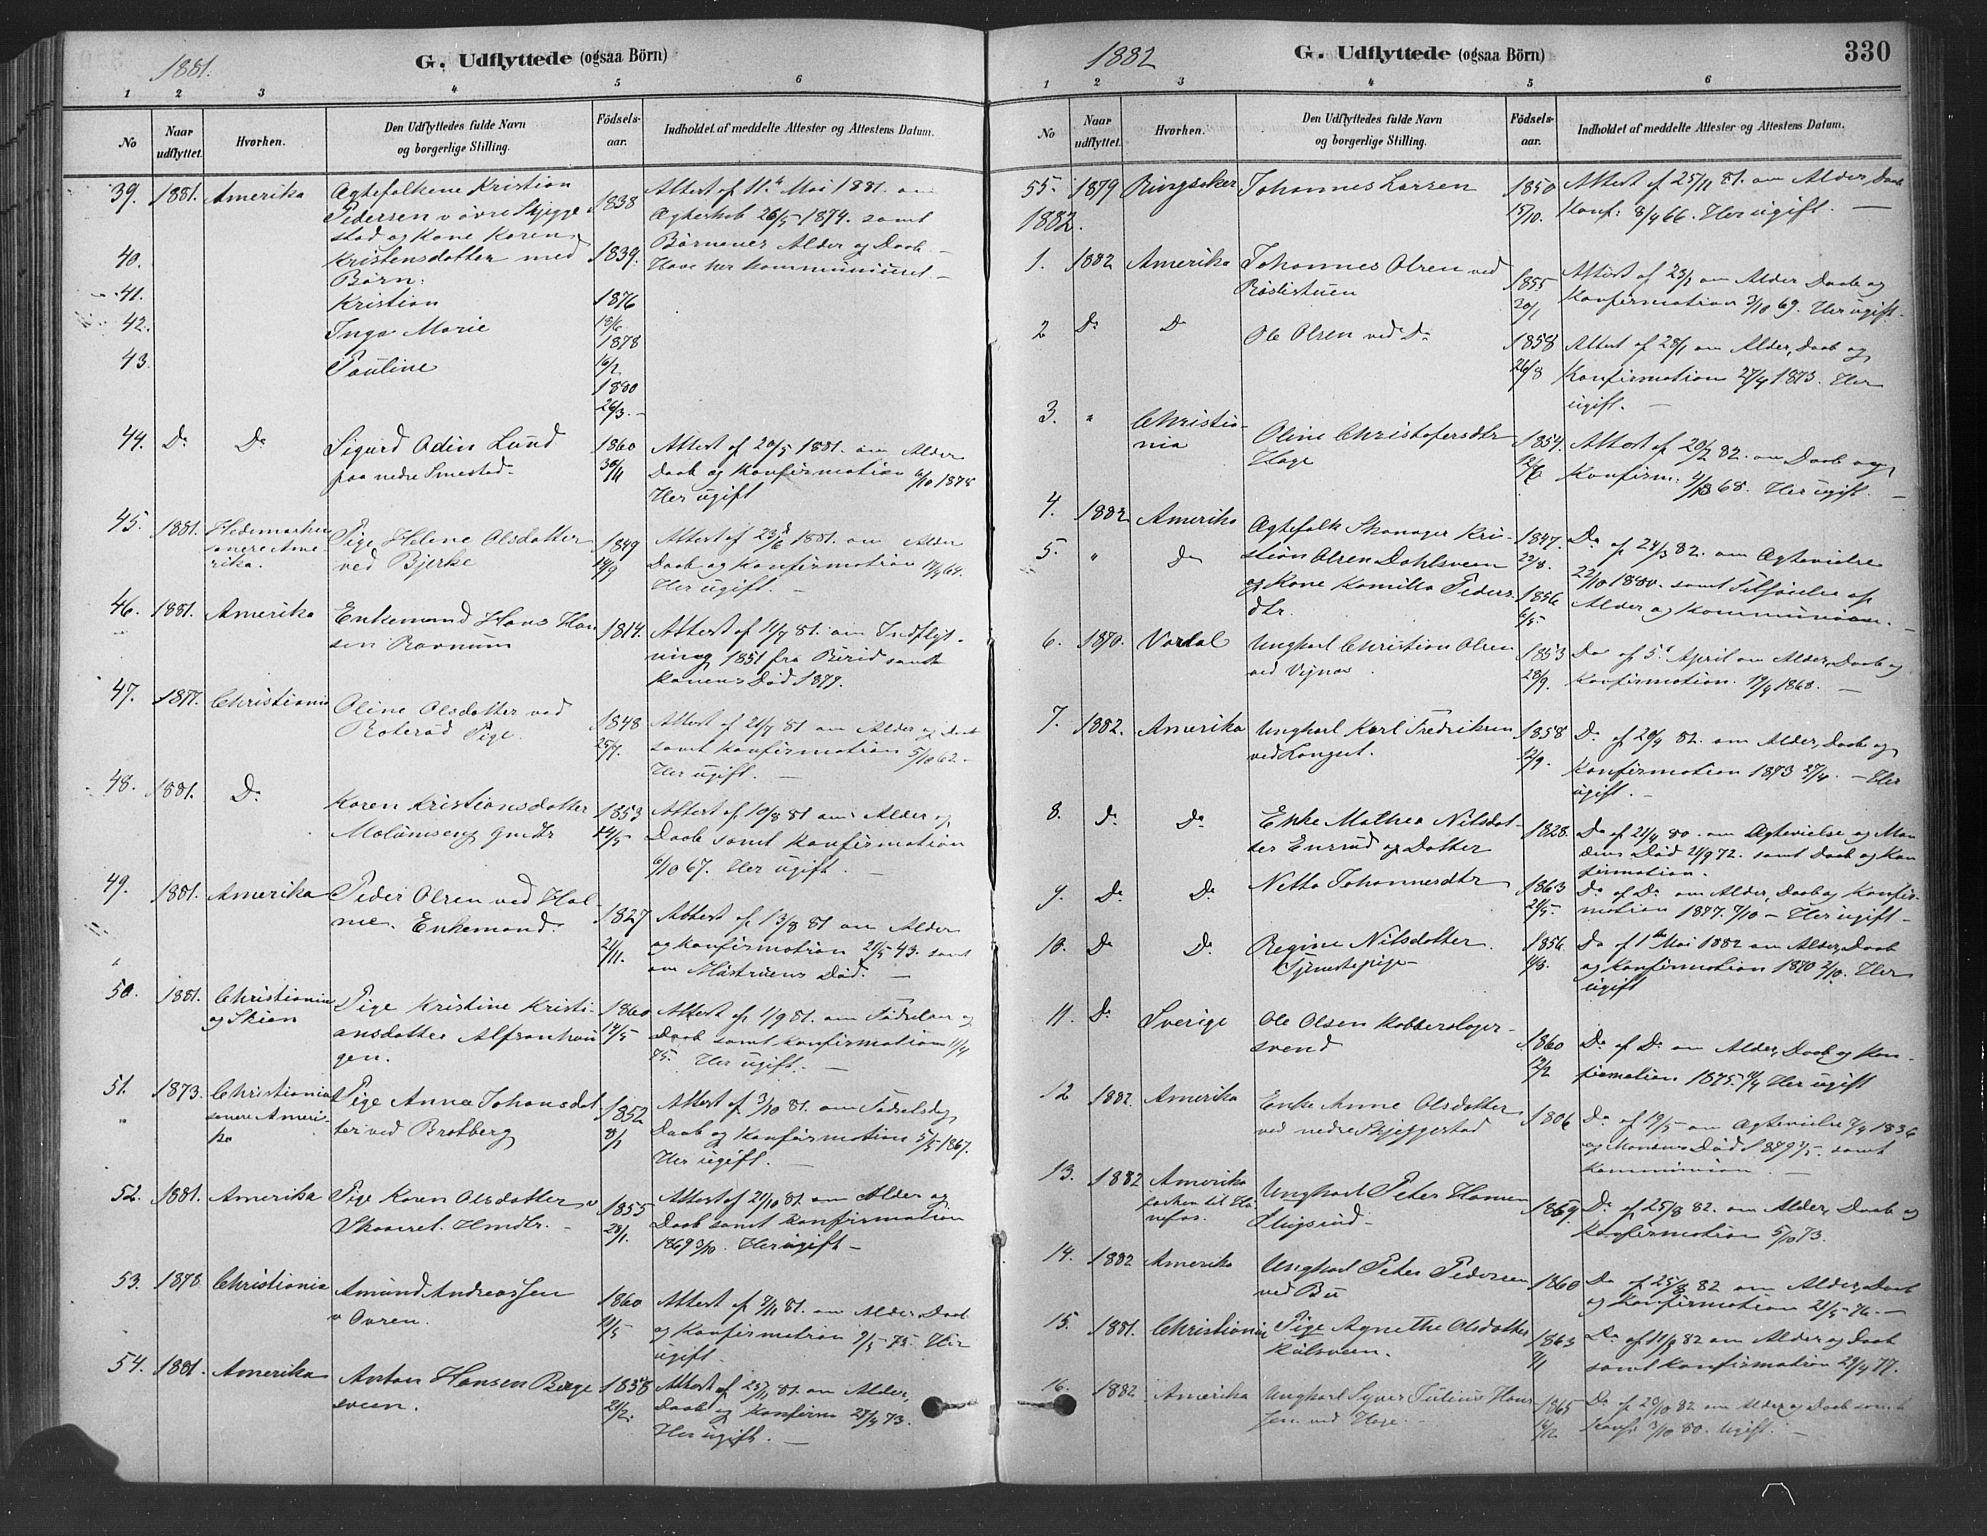 SAH, Fåberg prestekontor, Ministerialbok nr. 9, 1879-1898, s. 330